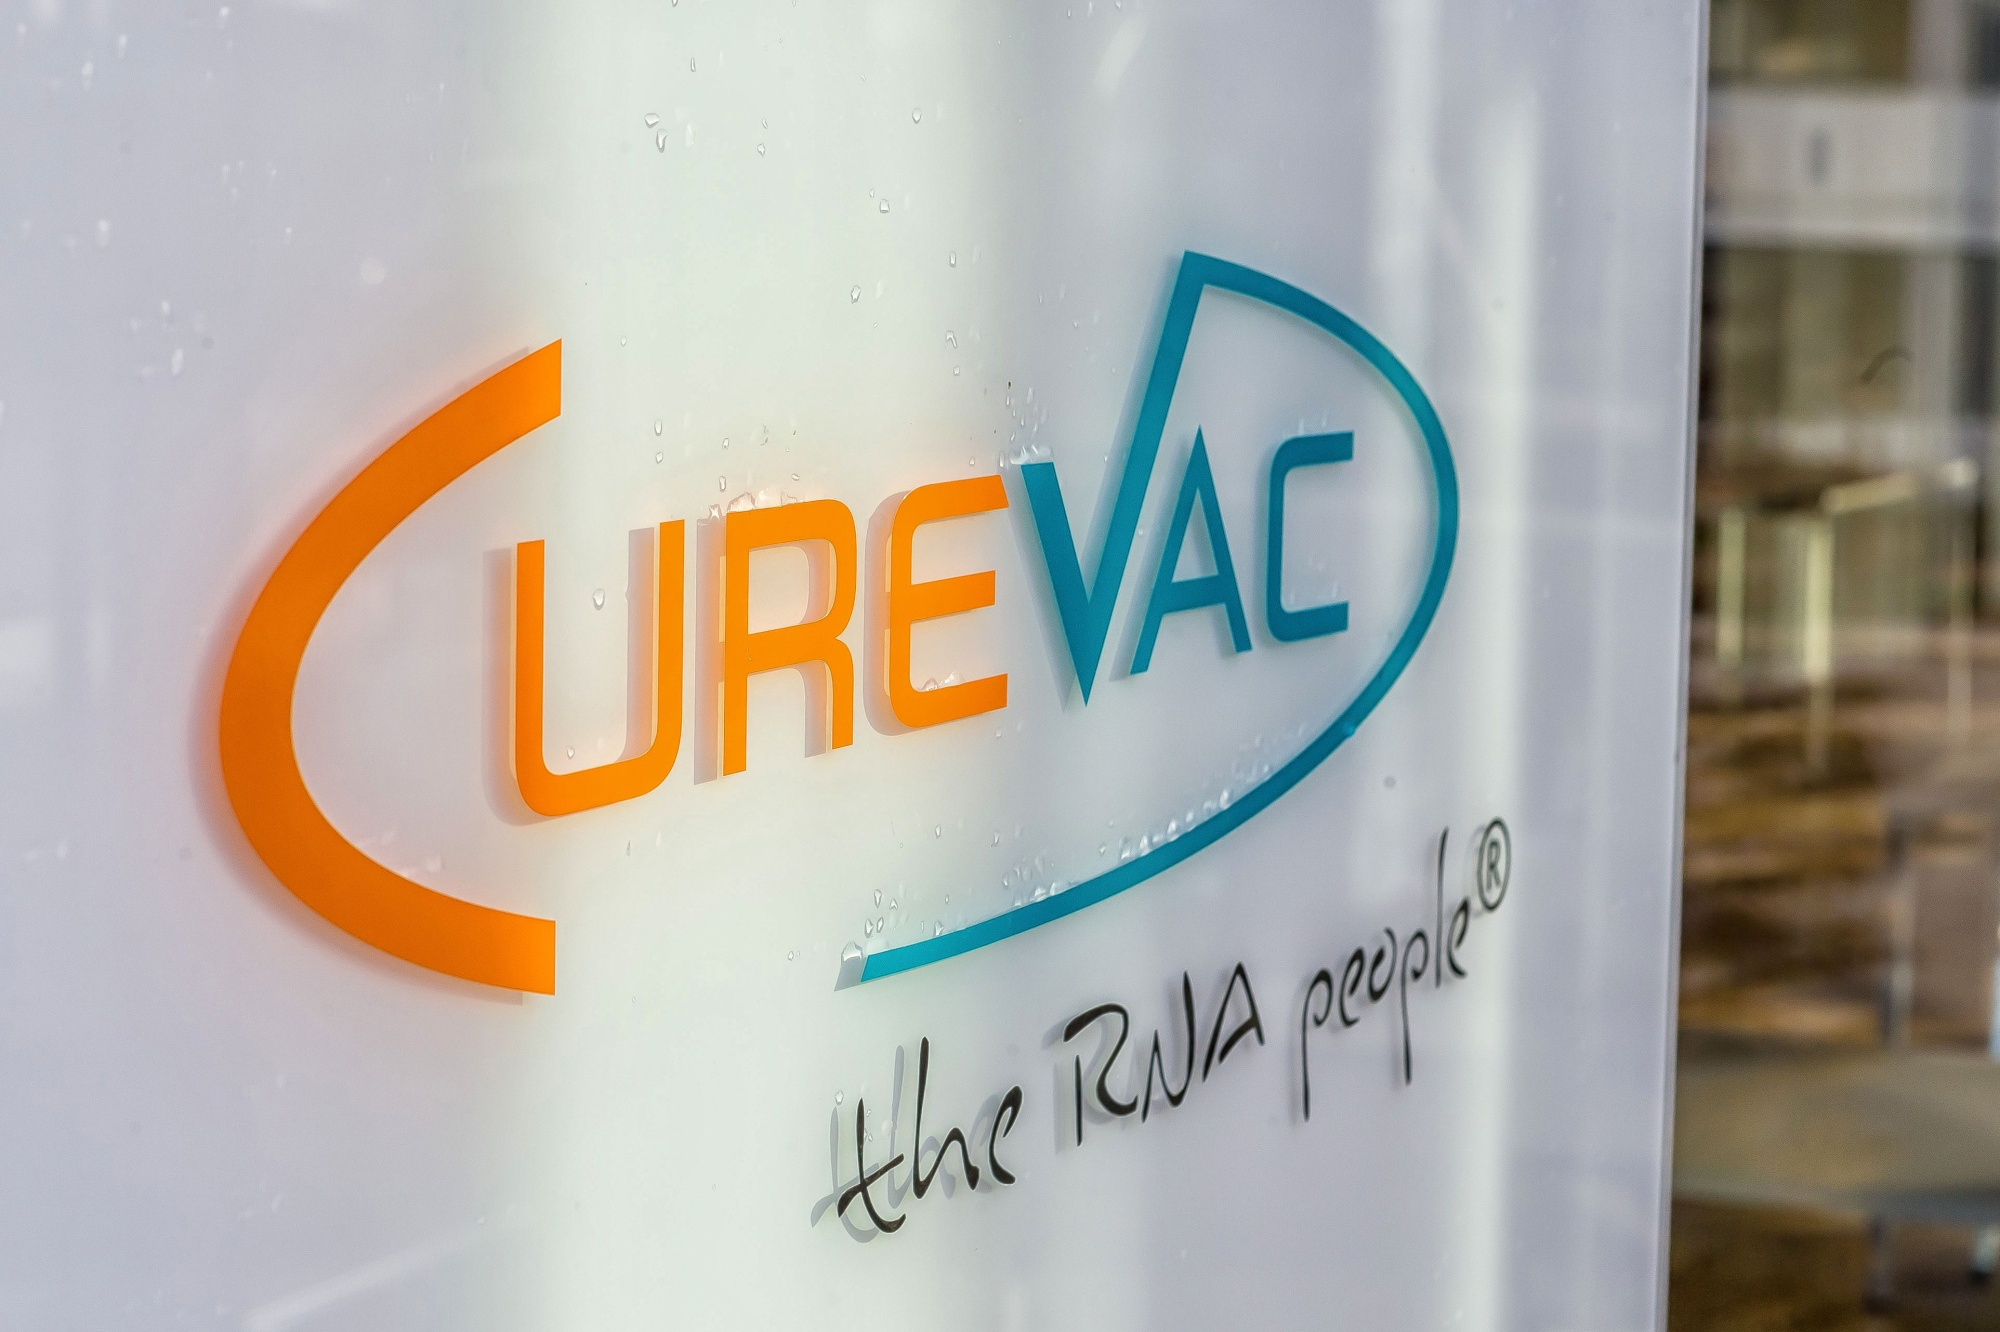 CUREVAC Headquarter